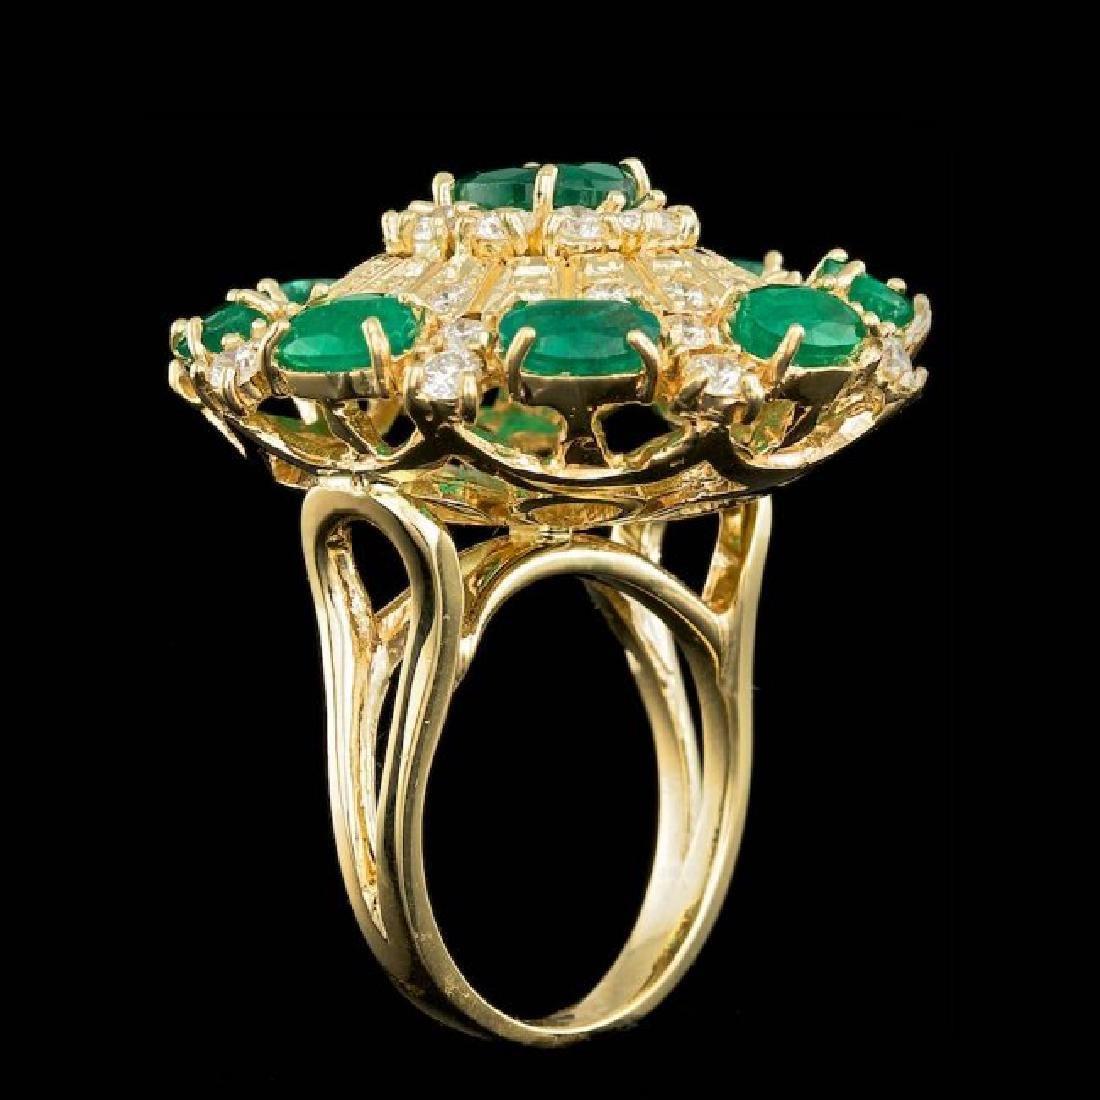 14k Gold 5.00ct Emerald 2.00ct Diamond Ring - 5